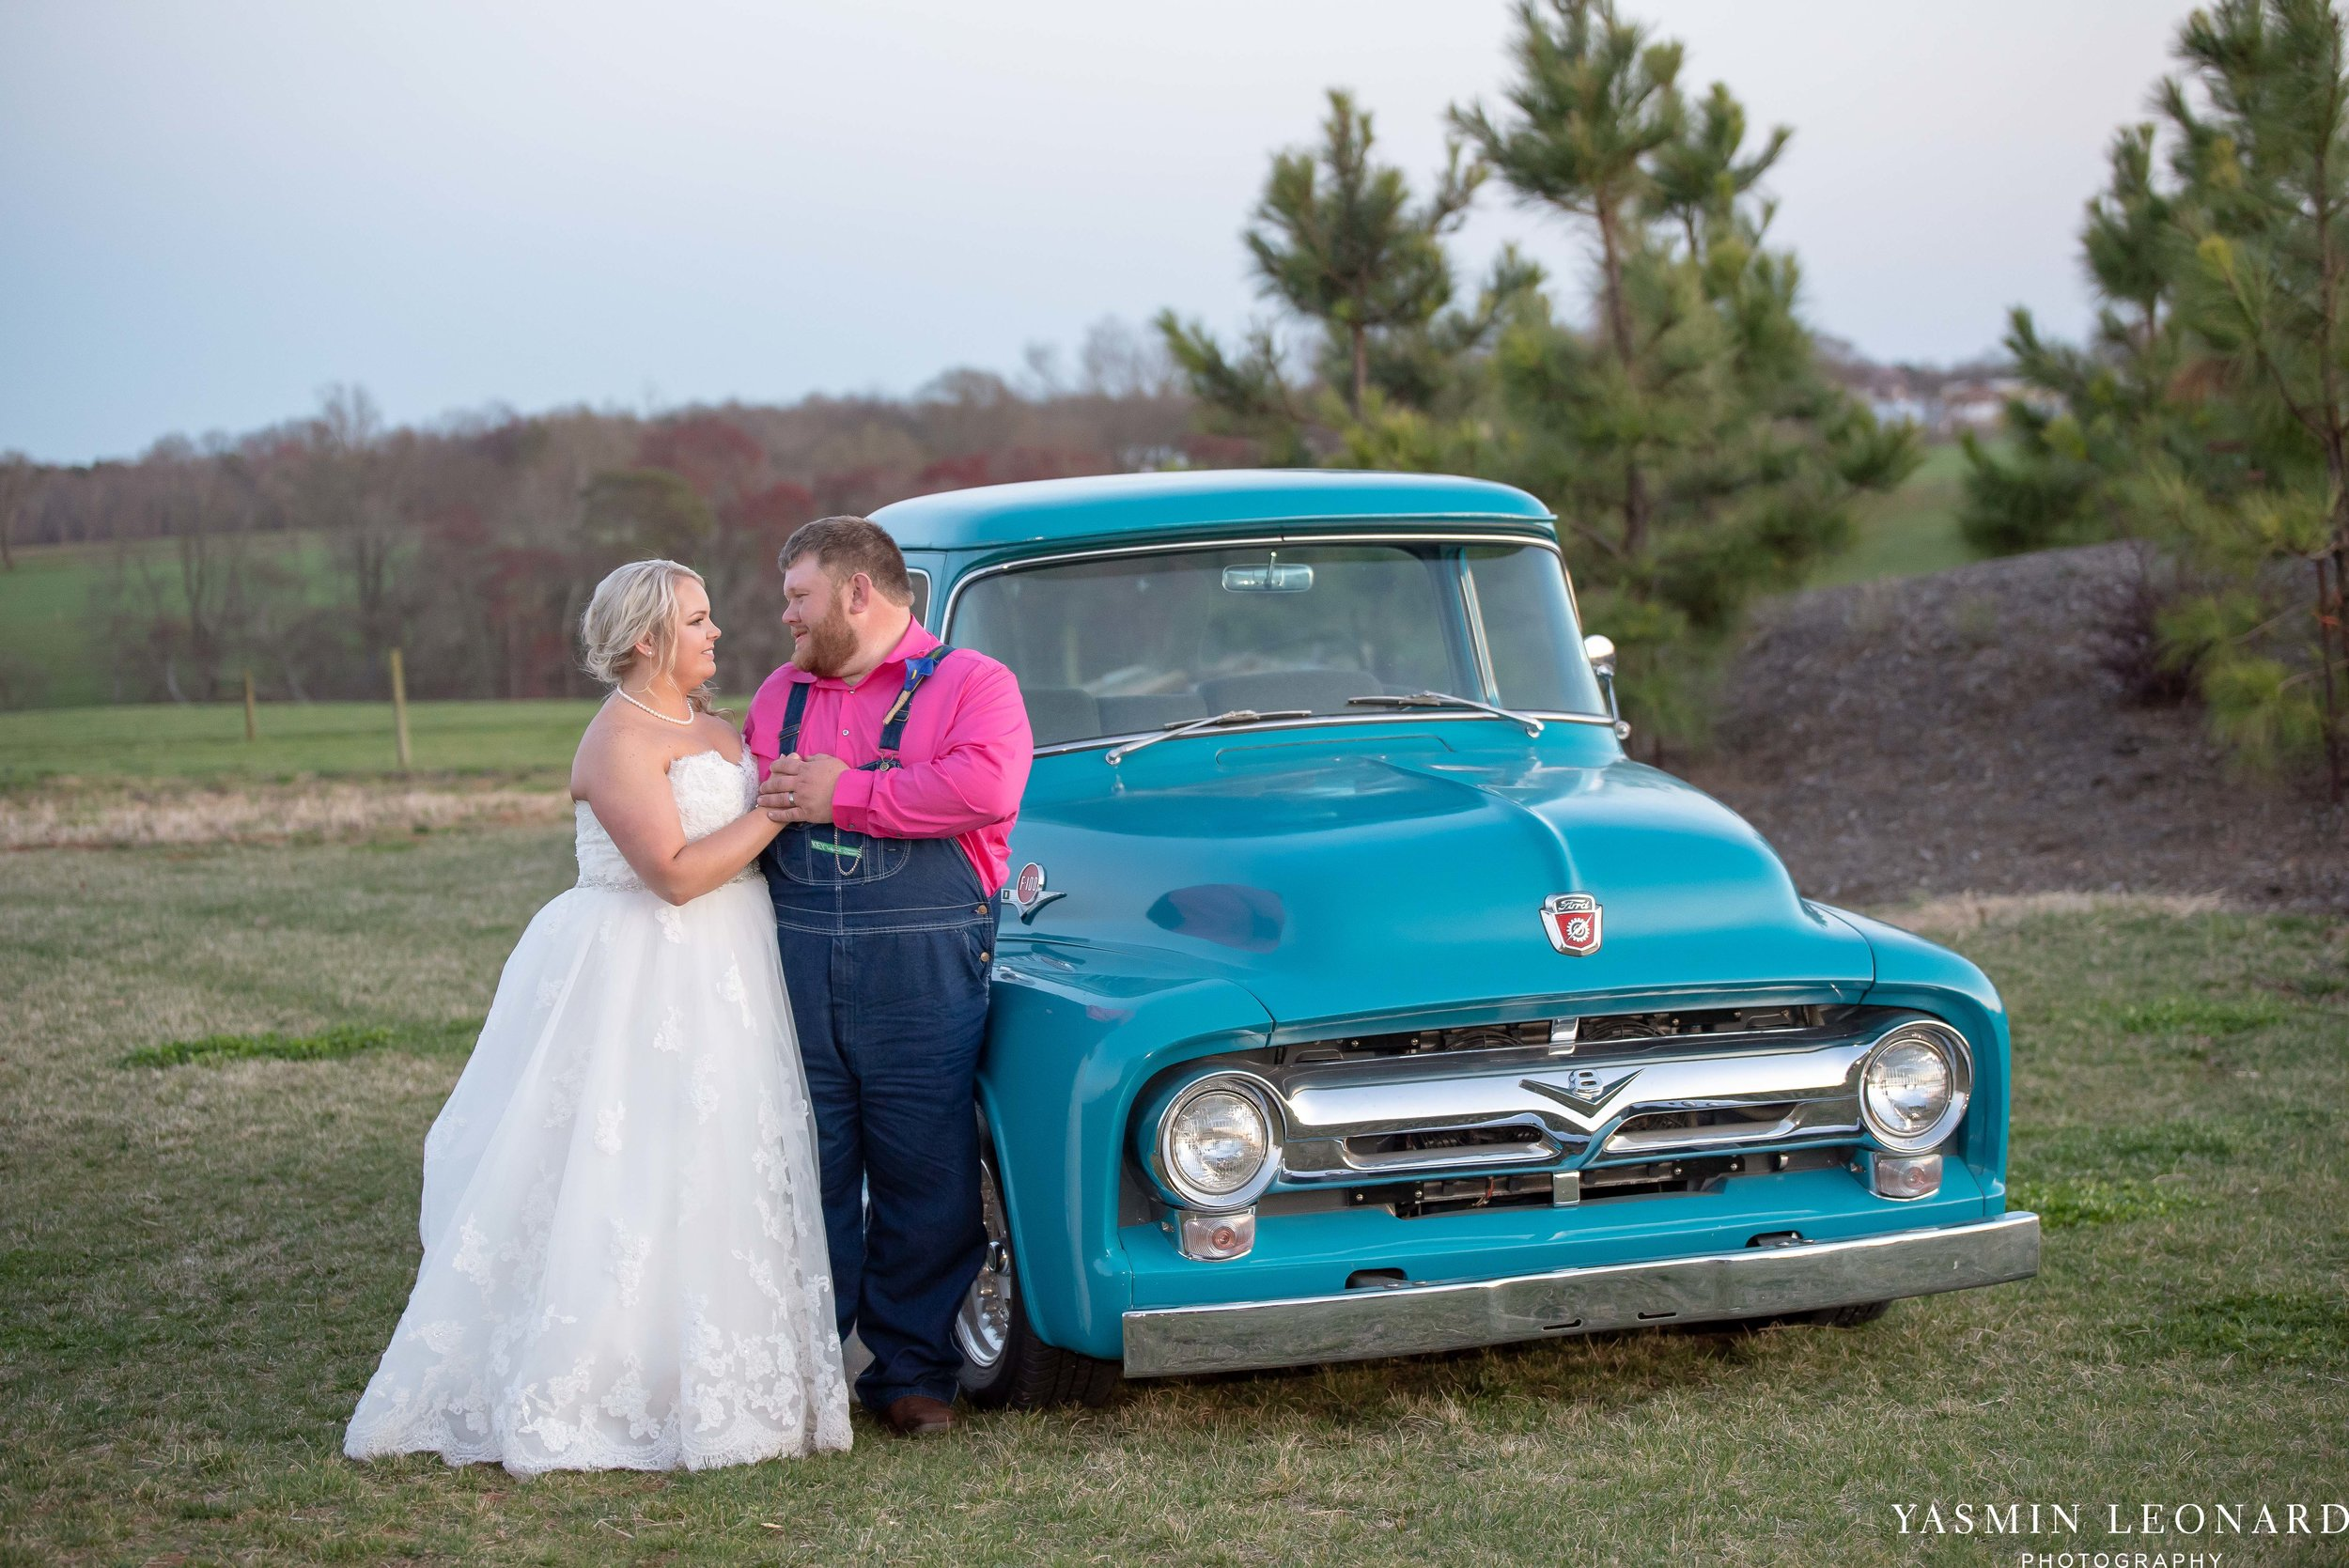 The Barn at Heritage Farm - Country Wedding - Pink and Blue Wedding - Barn Wedding - Outdoor Wedding - Cotton and Wheat Decor - Groom in Bibs - Pink Bridal Colors - Yasmin Leonard Photography-28.jpg